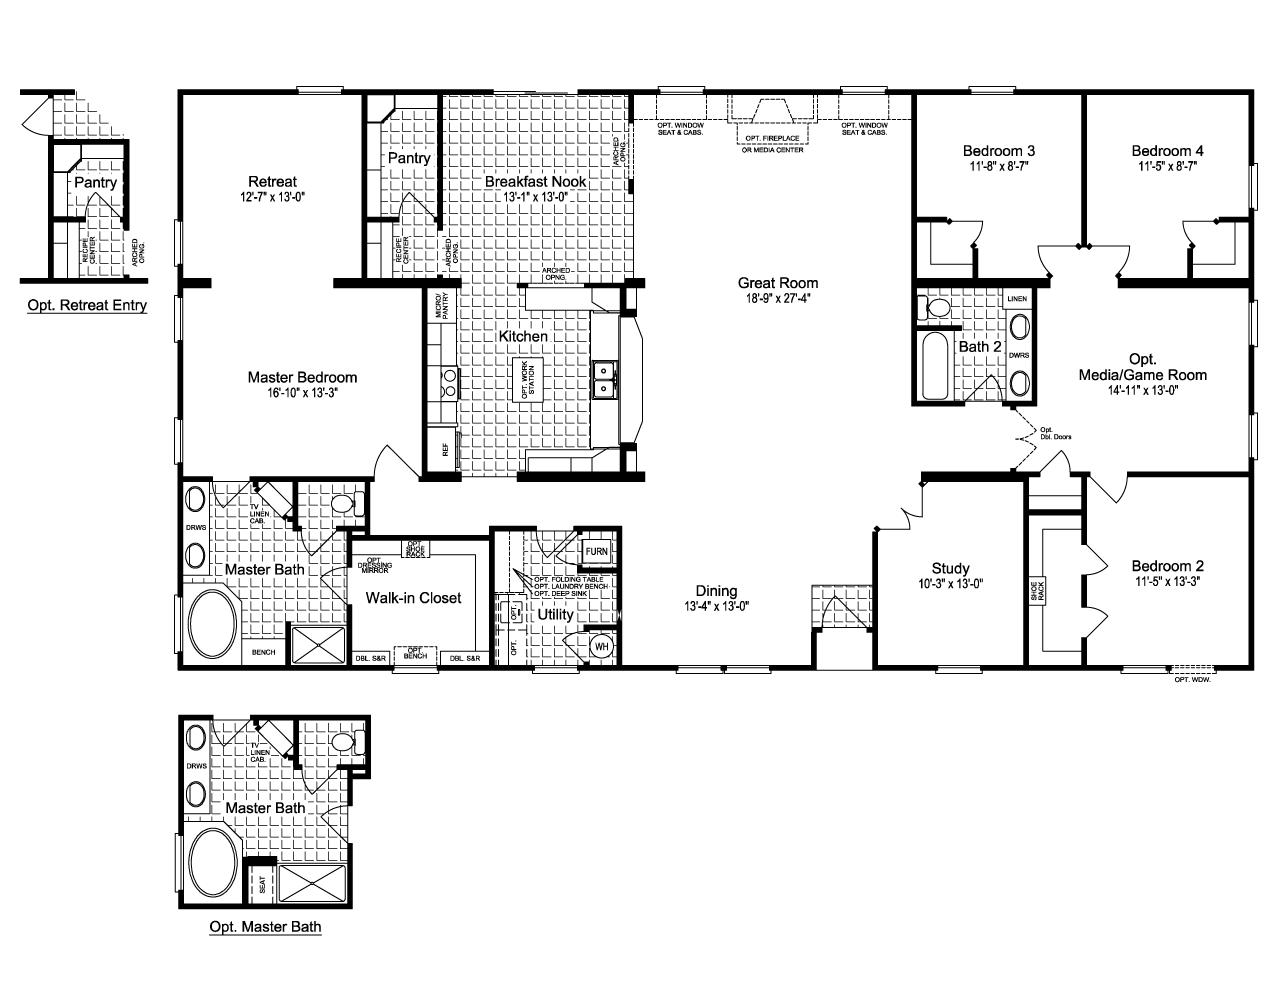 The Evolution Vr41764c Manufactured Home Floor Plan Or Mobile Home Floor Plans Modular Home Floor Plans Modular Home Plans